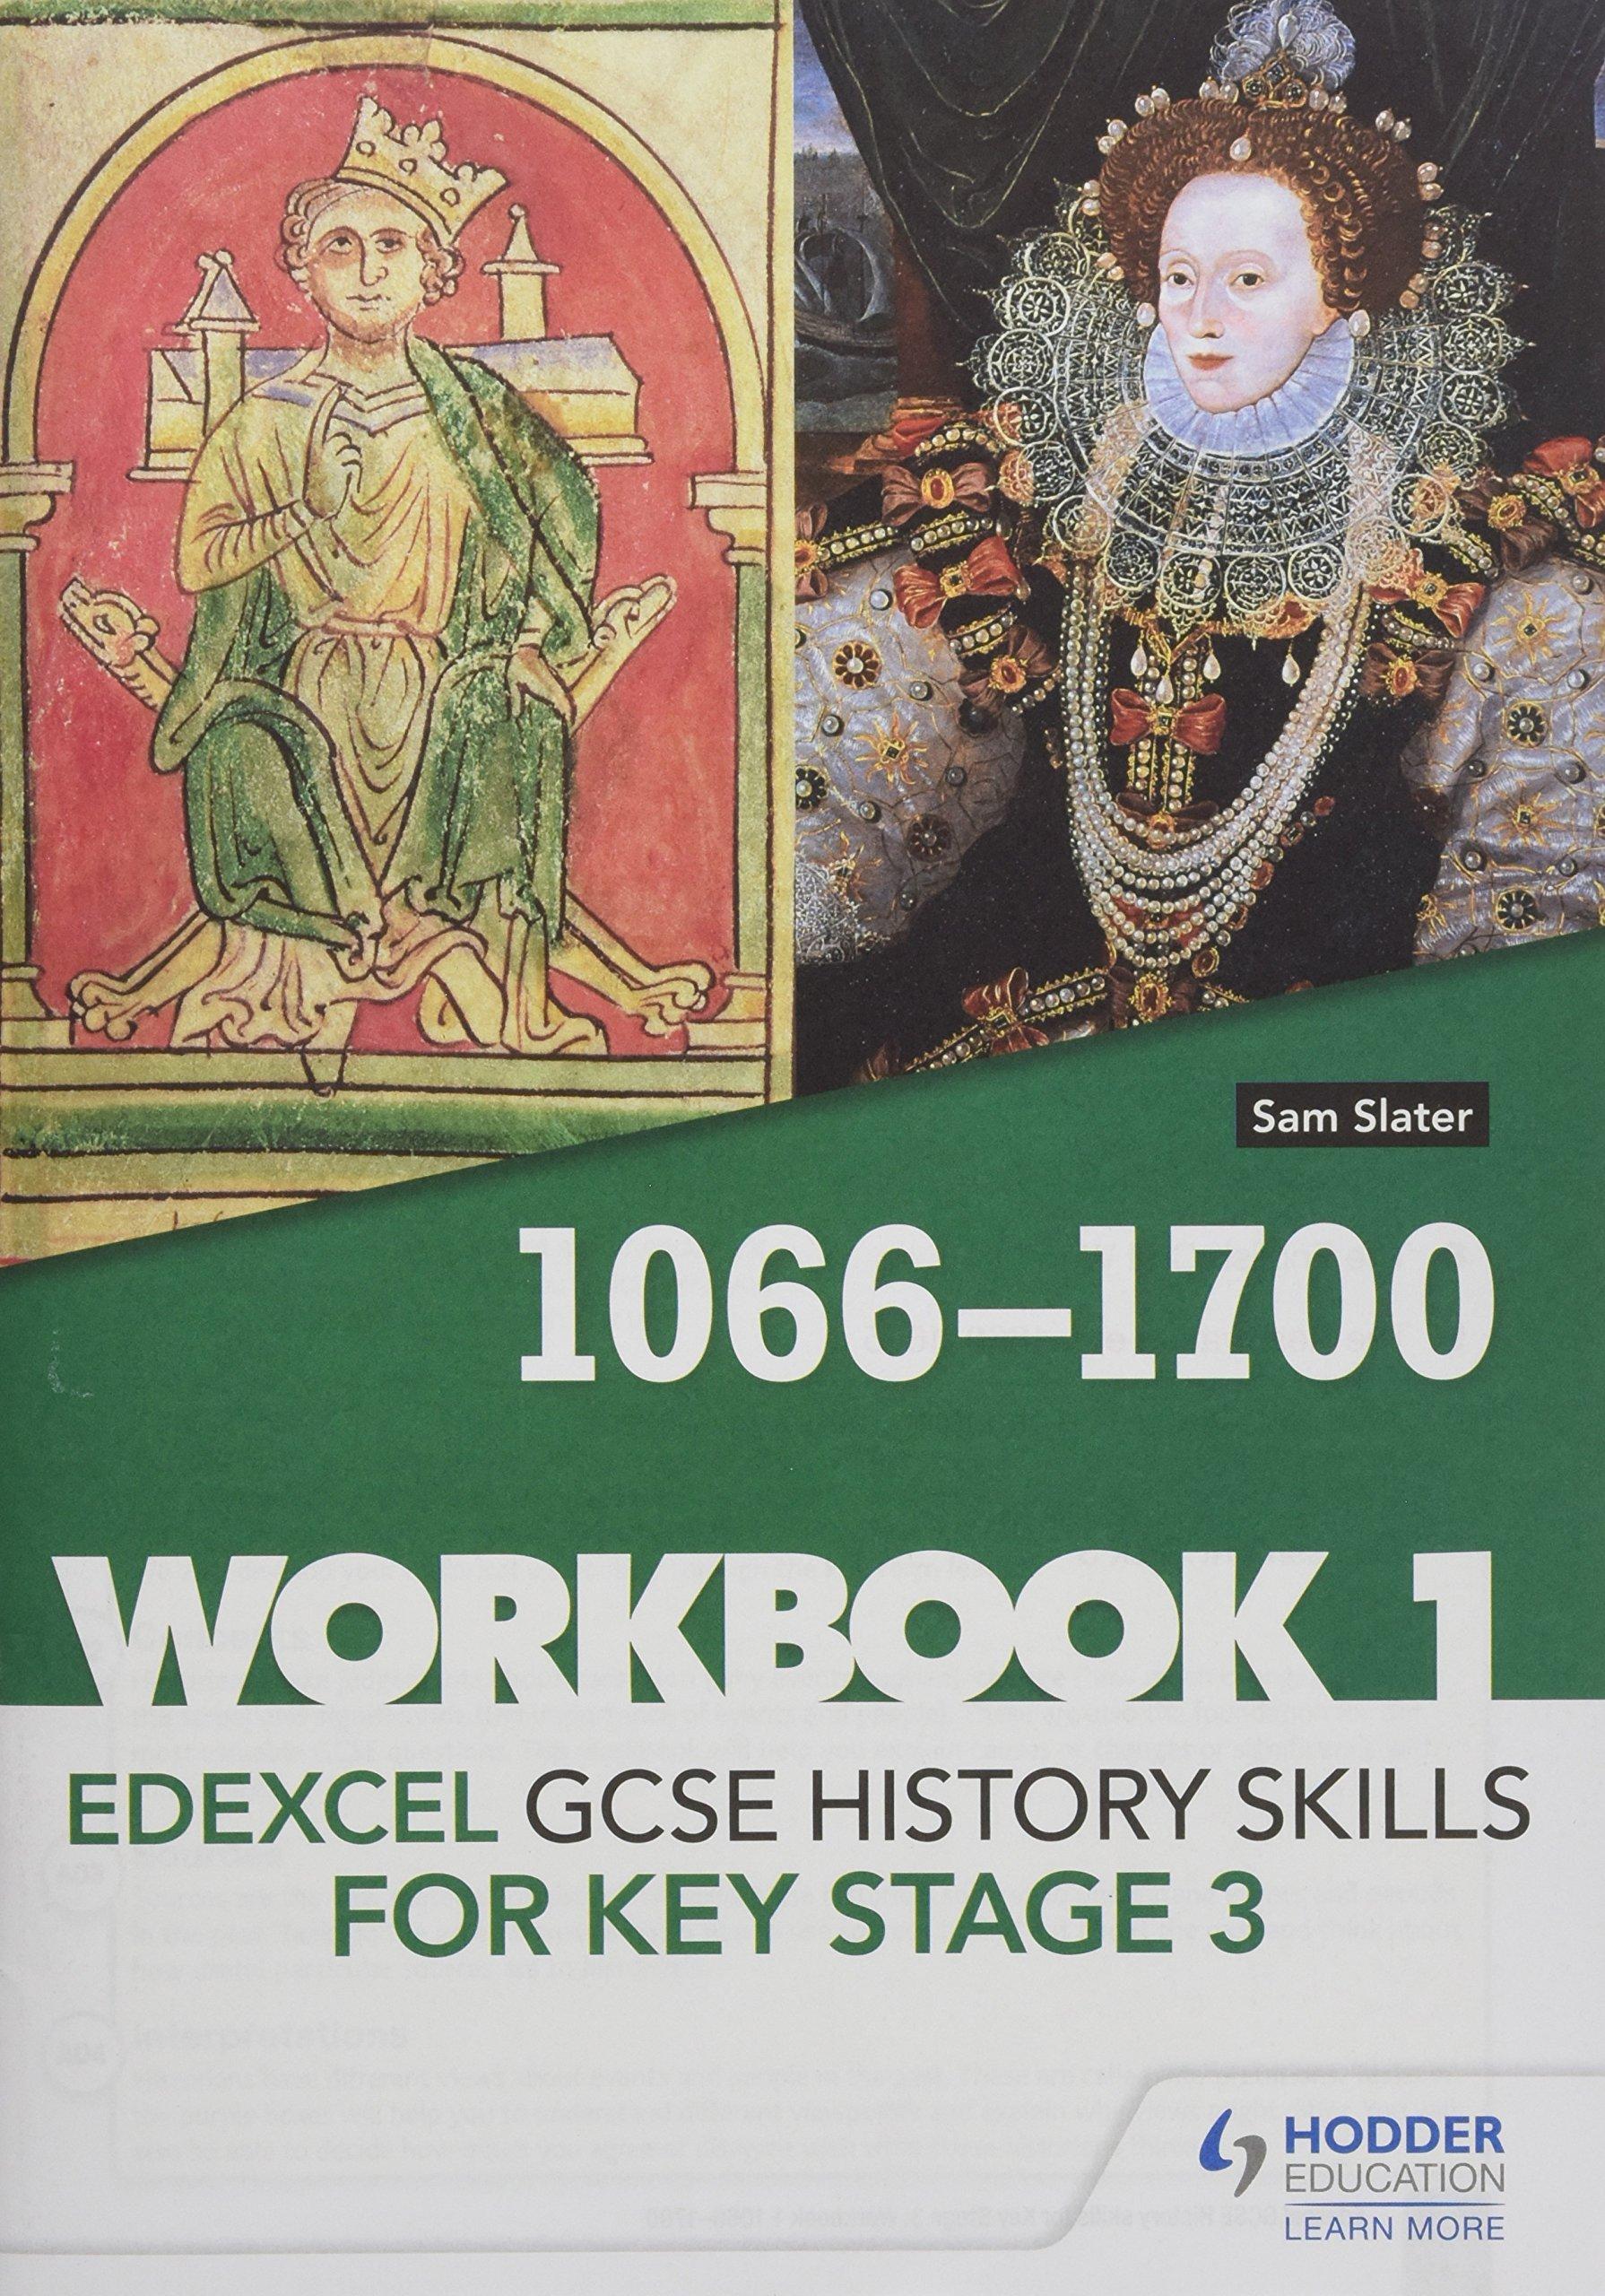 Edexcel GCSE History skills for Key Stage 3: Workbook 1 1066